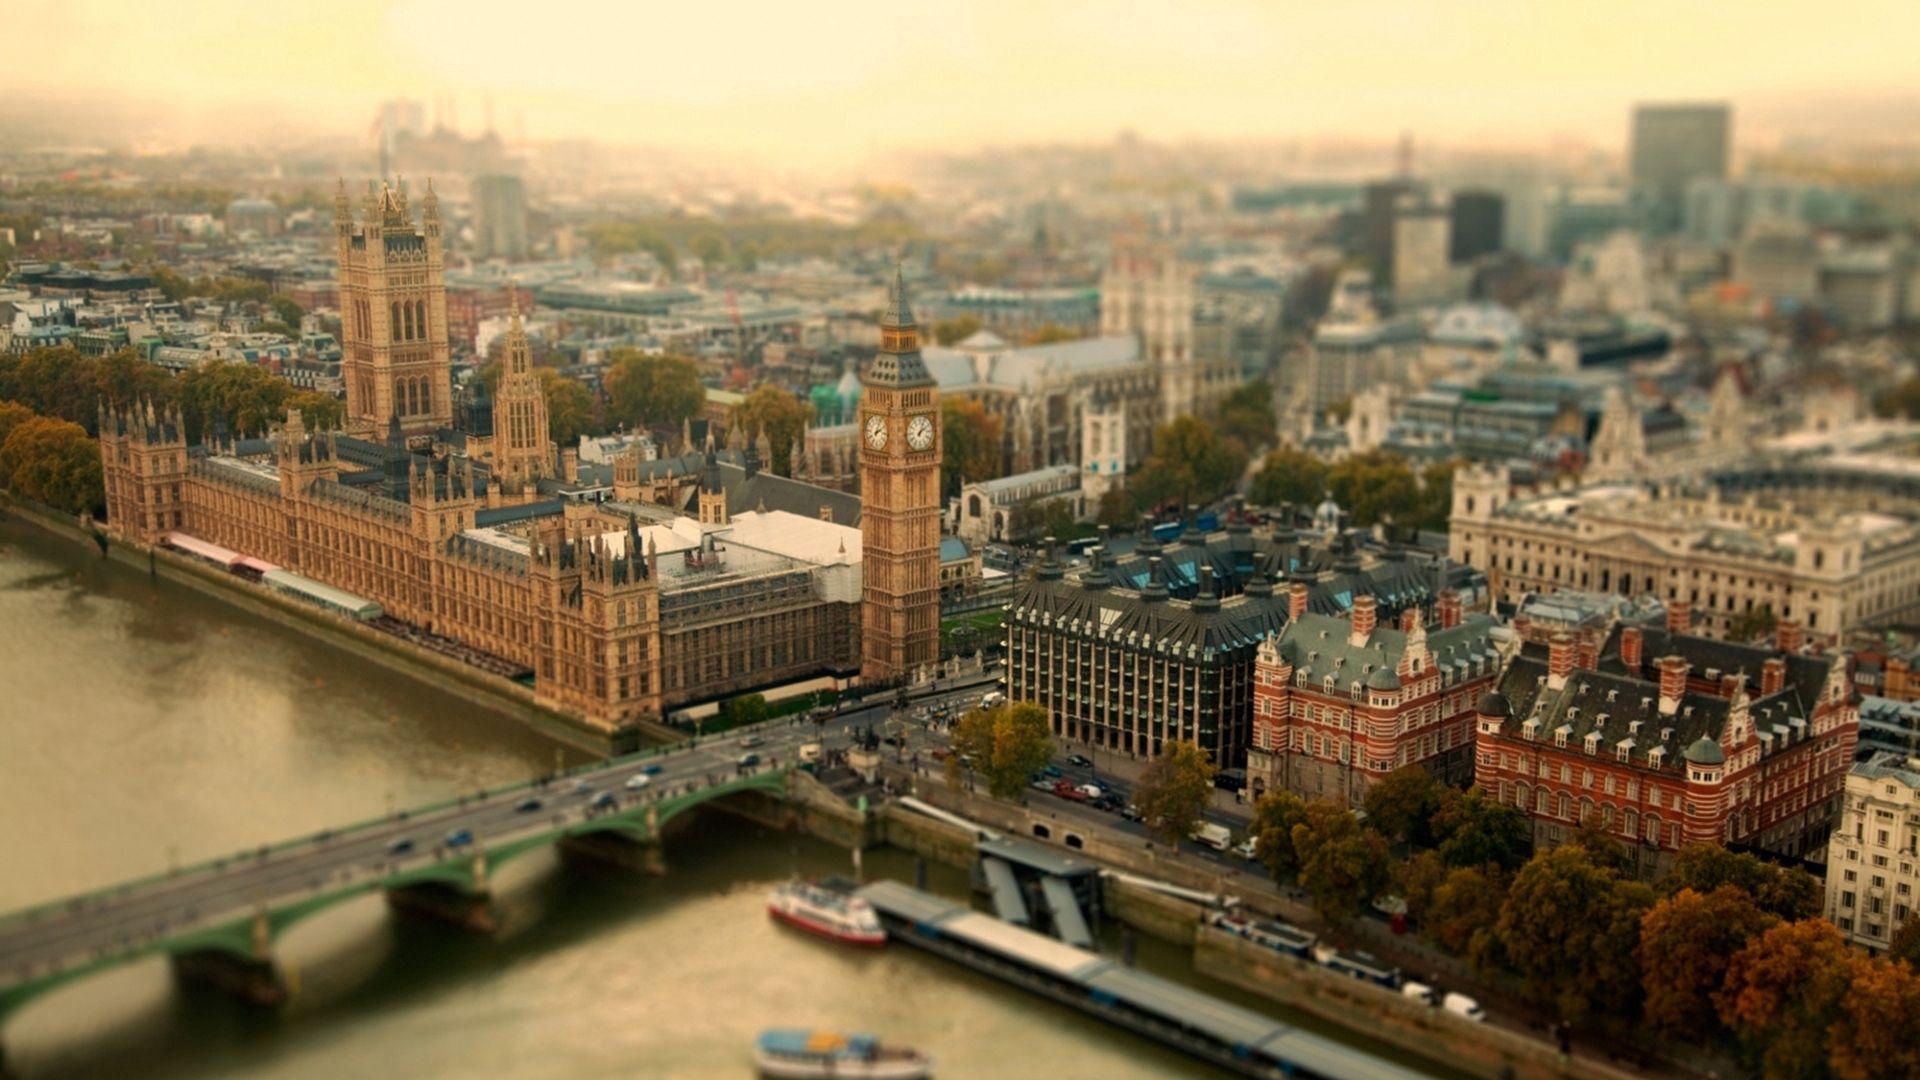 1920x1080 Wallpaper london, uk, city, tower bridge